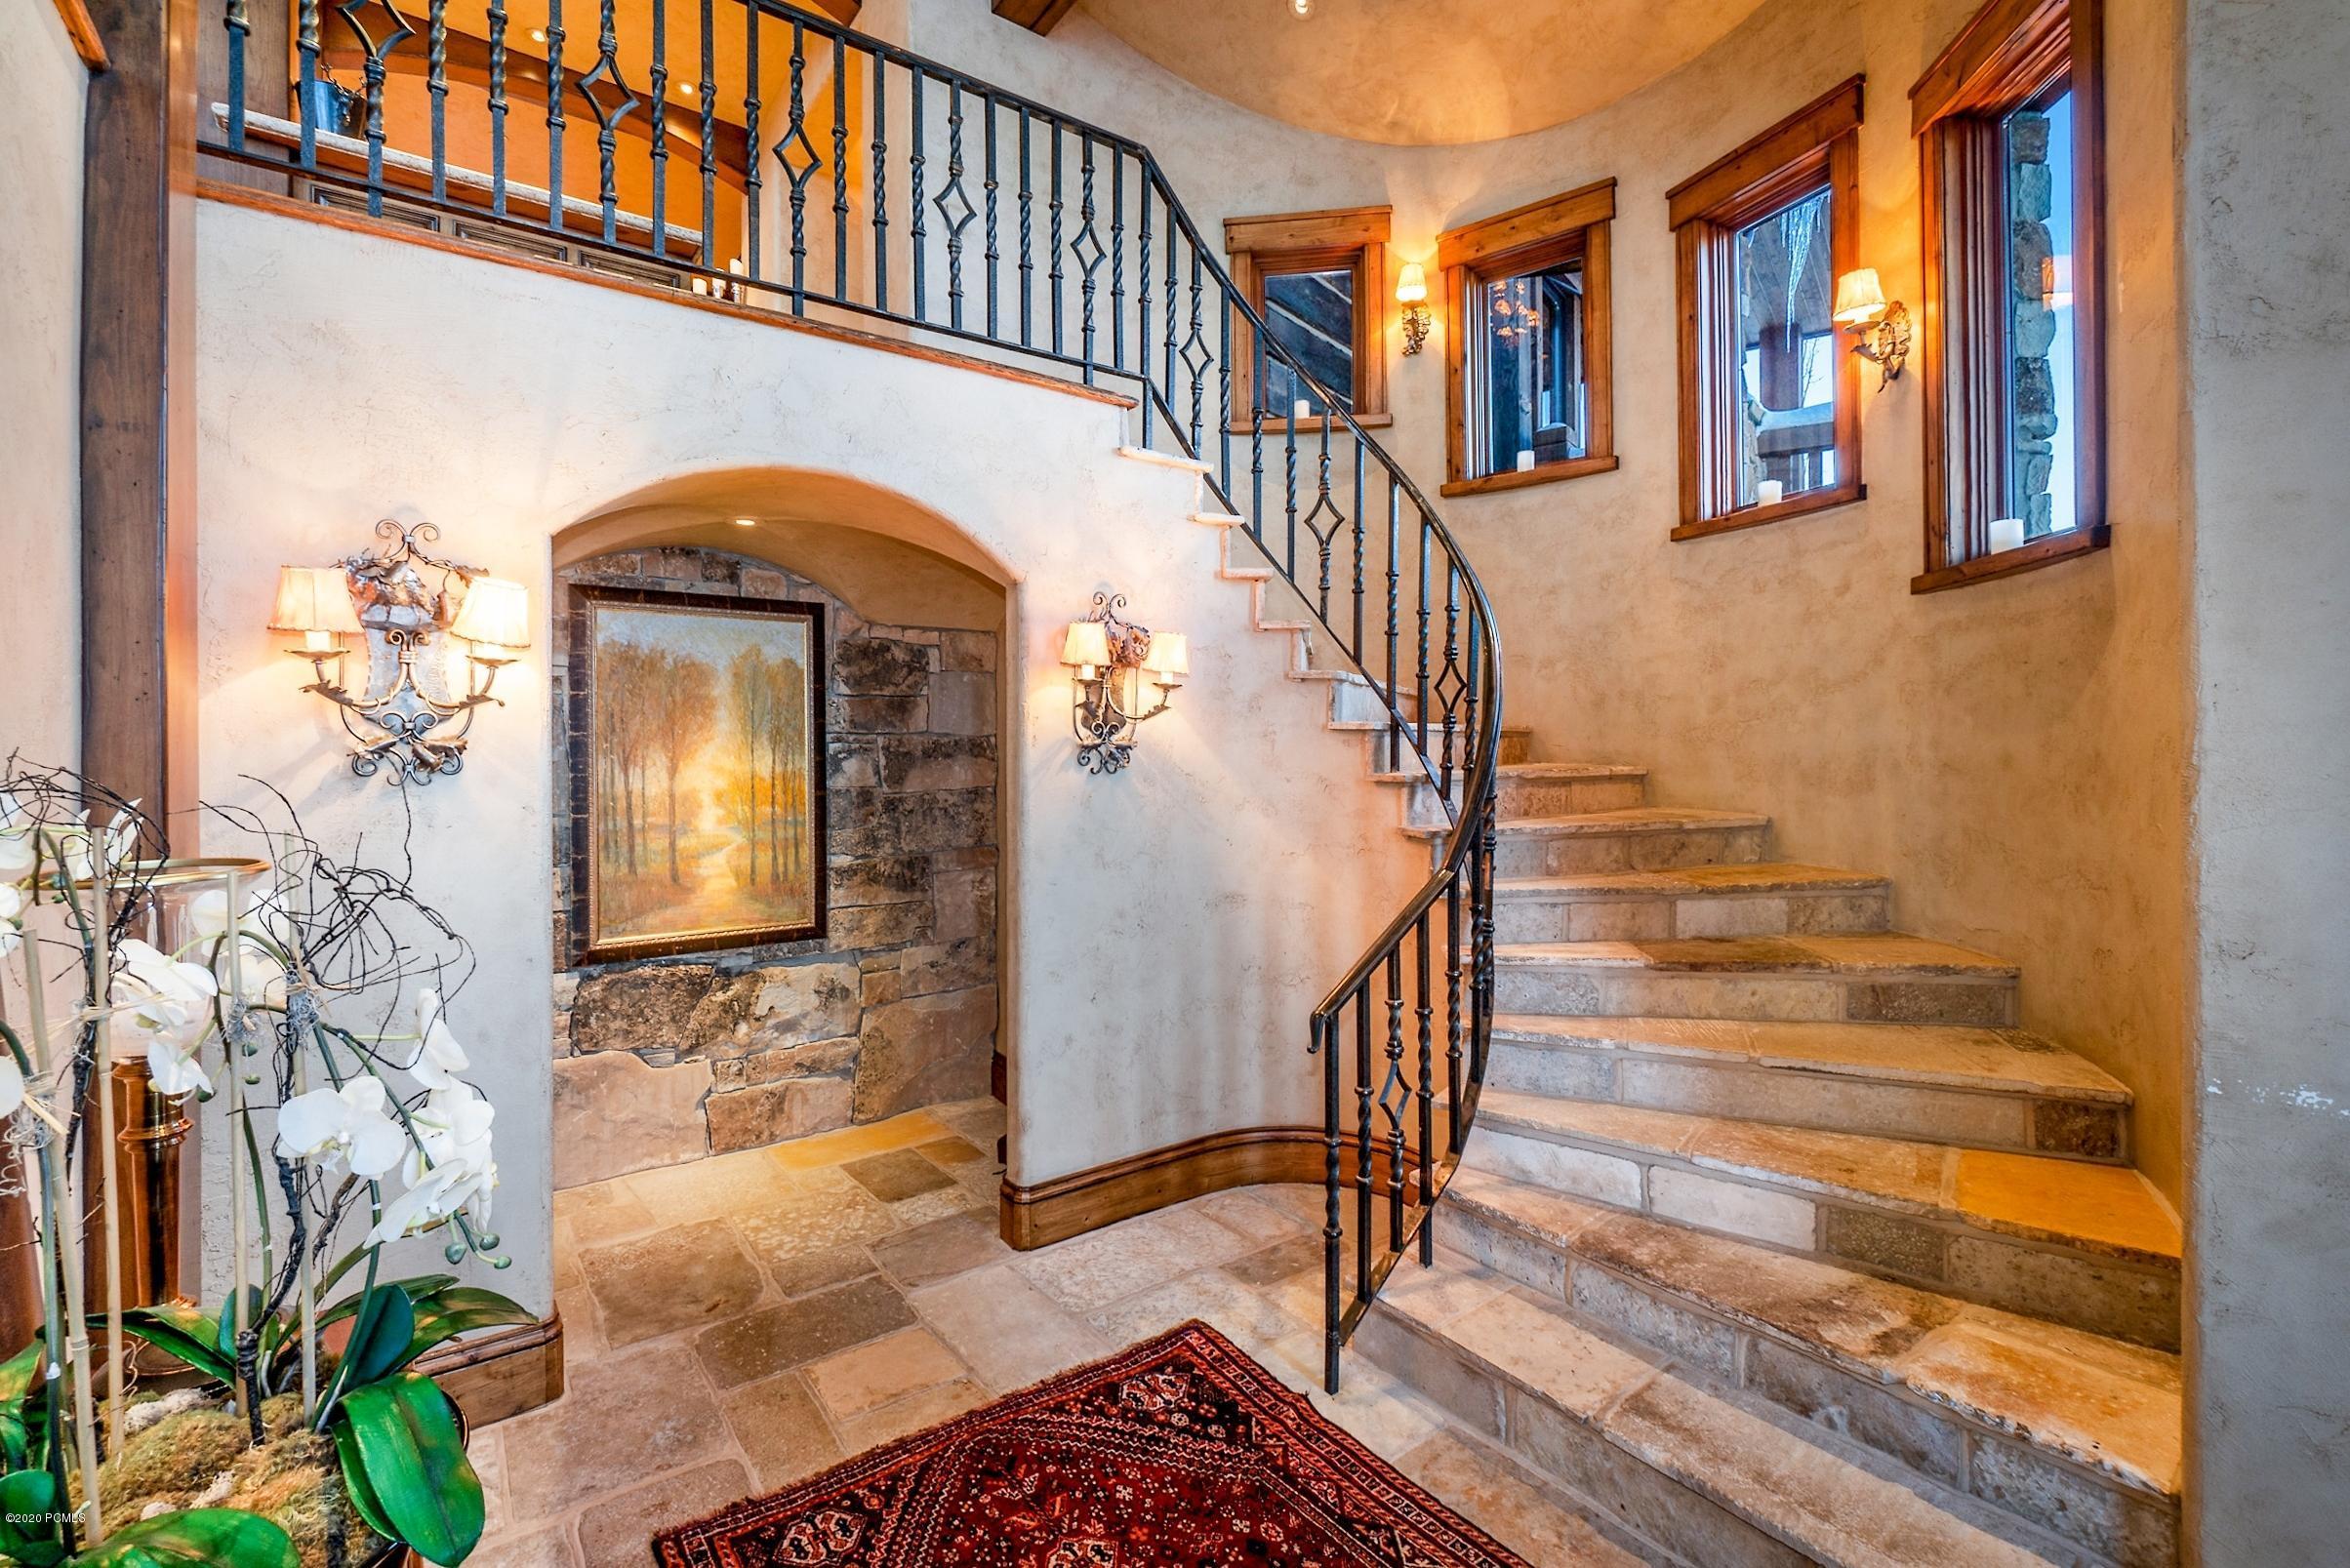 10663 Summit View Drive, Heber City, Utah 84032, 9 Bedrooms Bedrooms, ,12 BathroomsBathrooms,Single Family,For Sale,Summit View,12004654